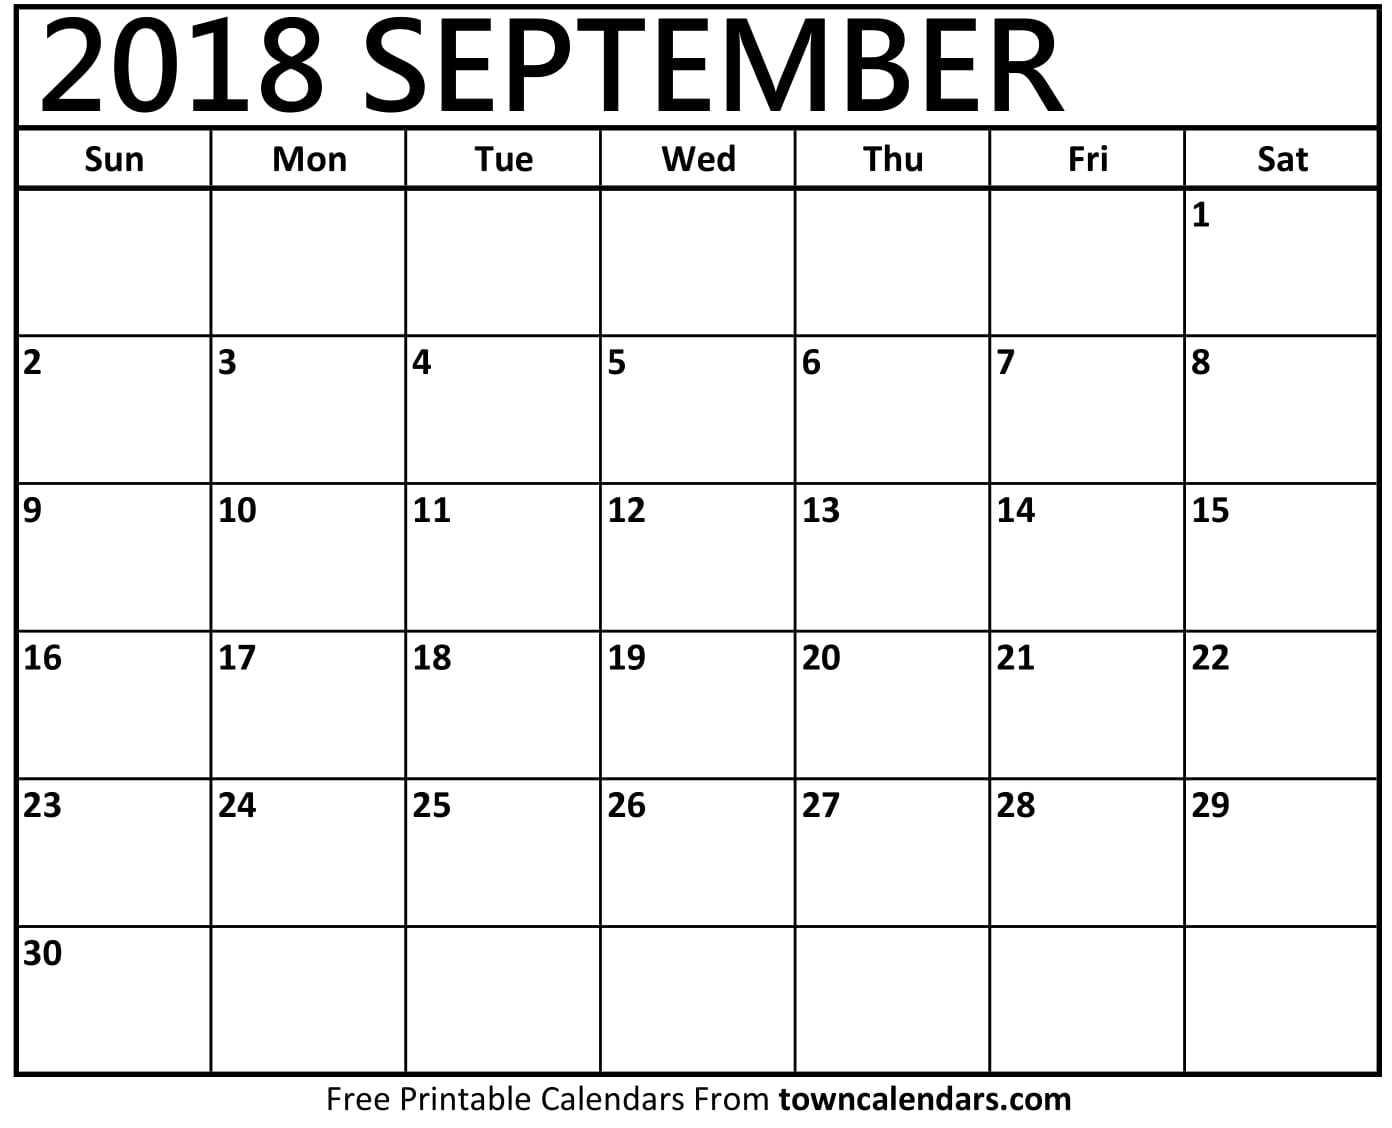 printable september 2018 calendar september 2018 calendar printable